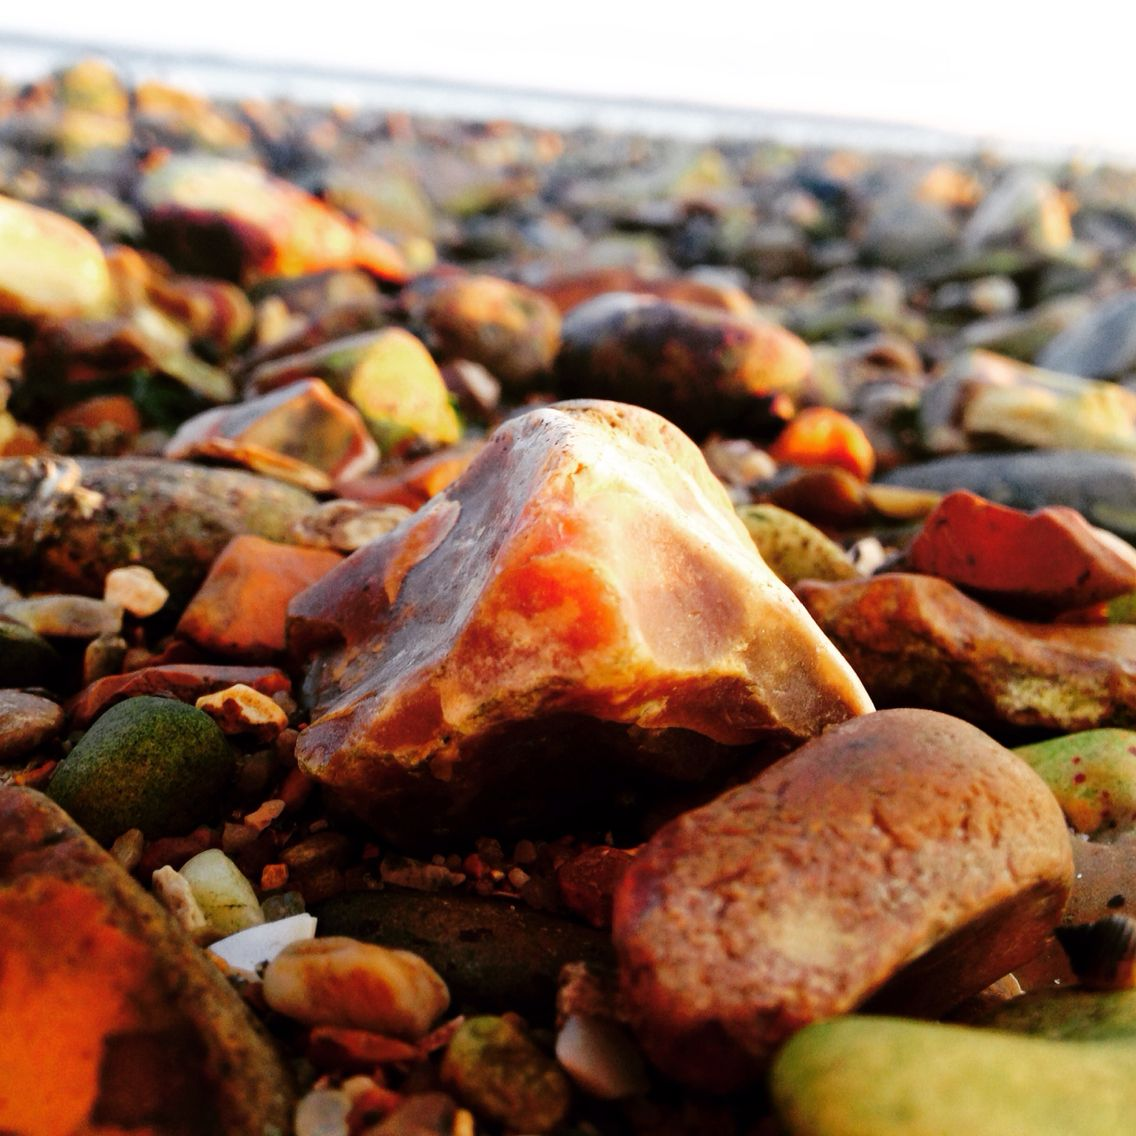 Gotta love a stone beach so I had to get a close up